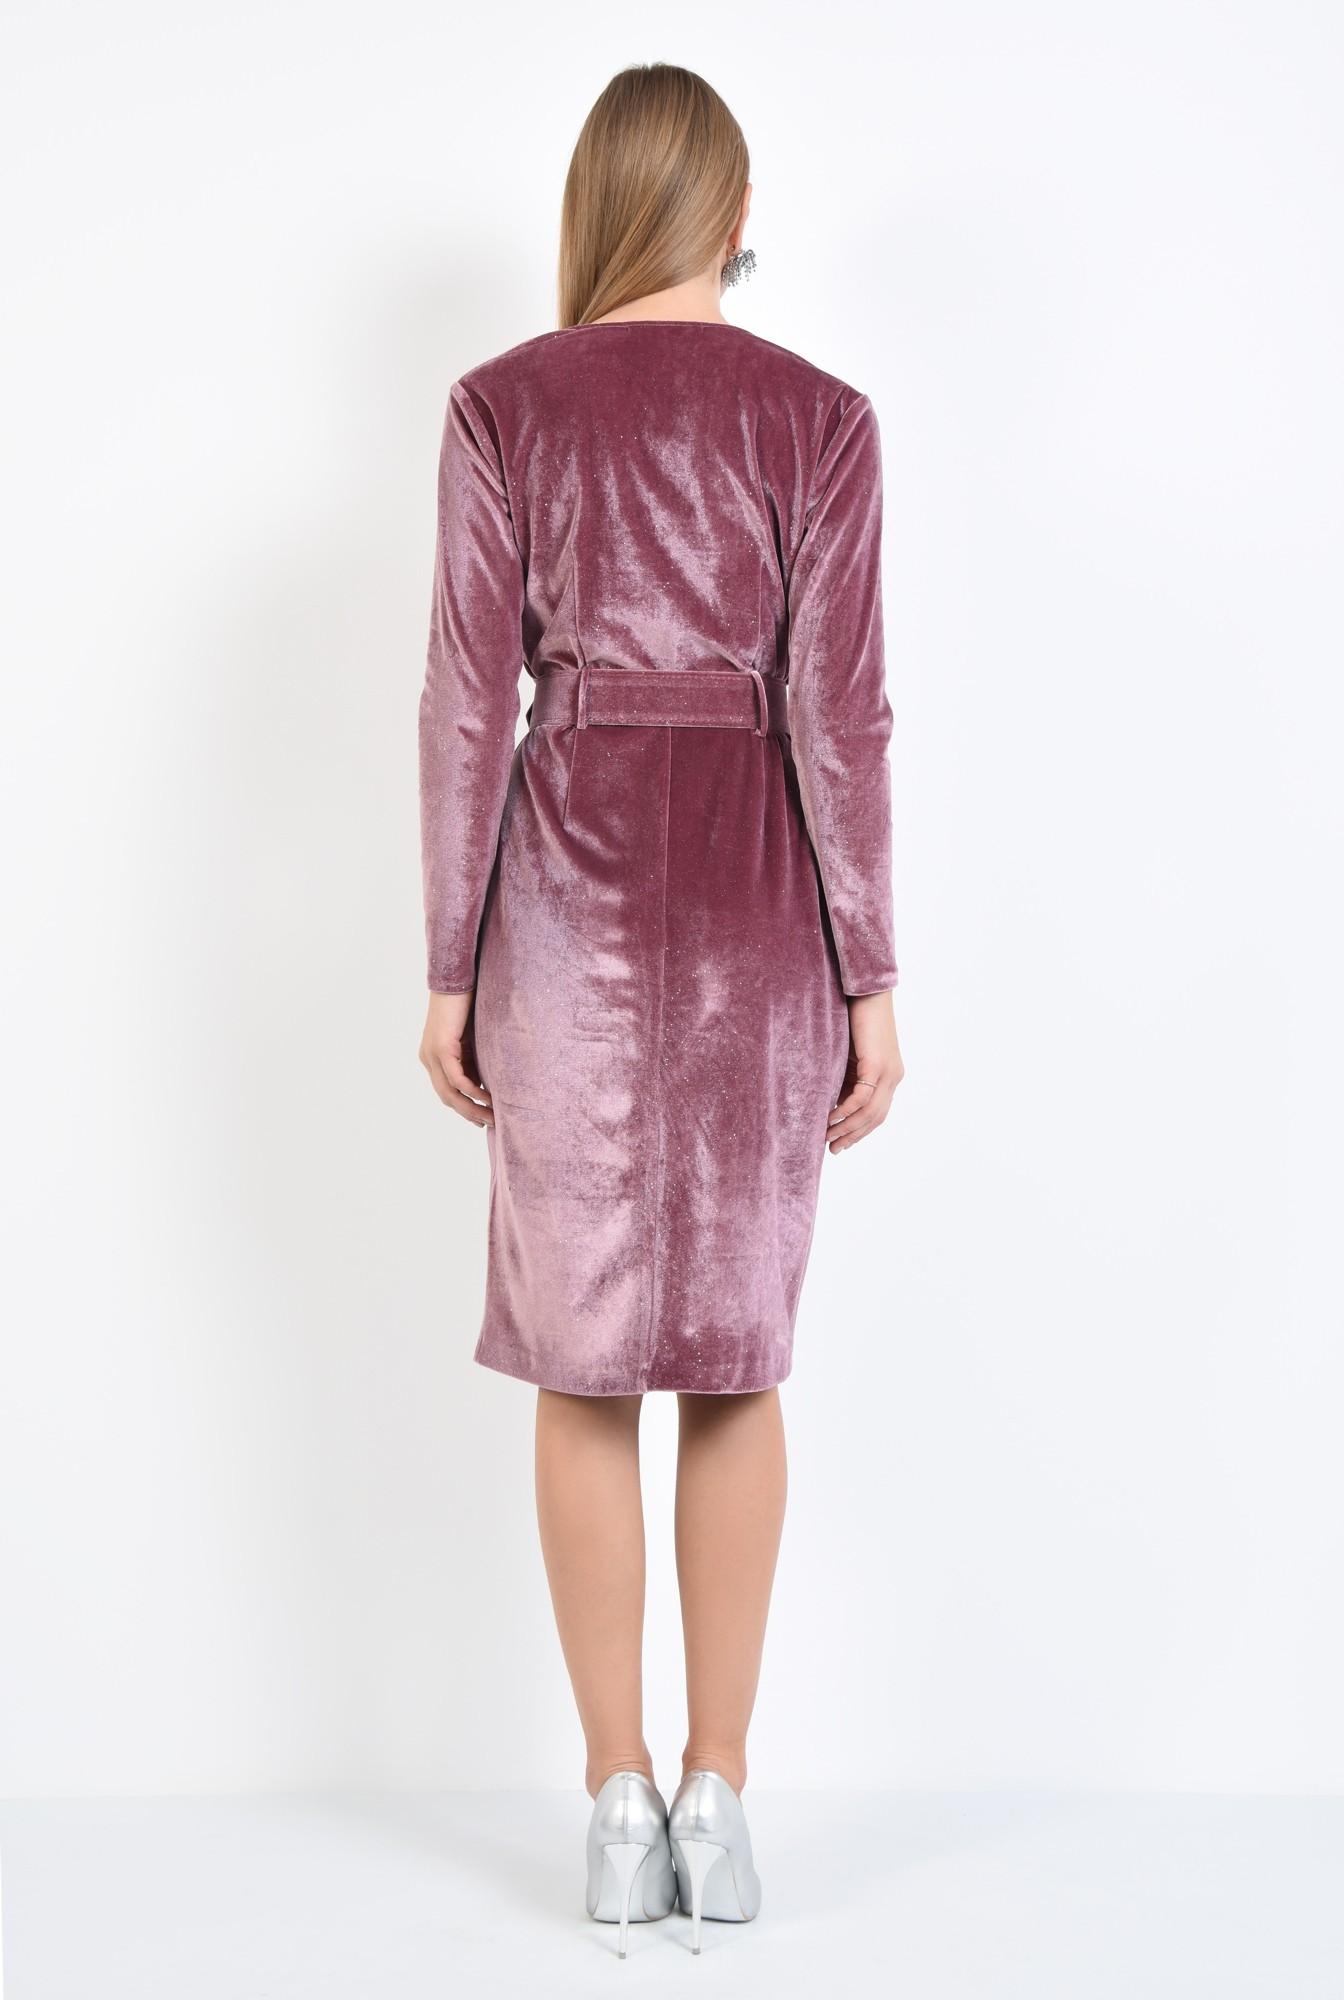 1 - 360 - rochie eleganta, croi conic, anchior petrecut, curea lata